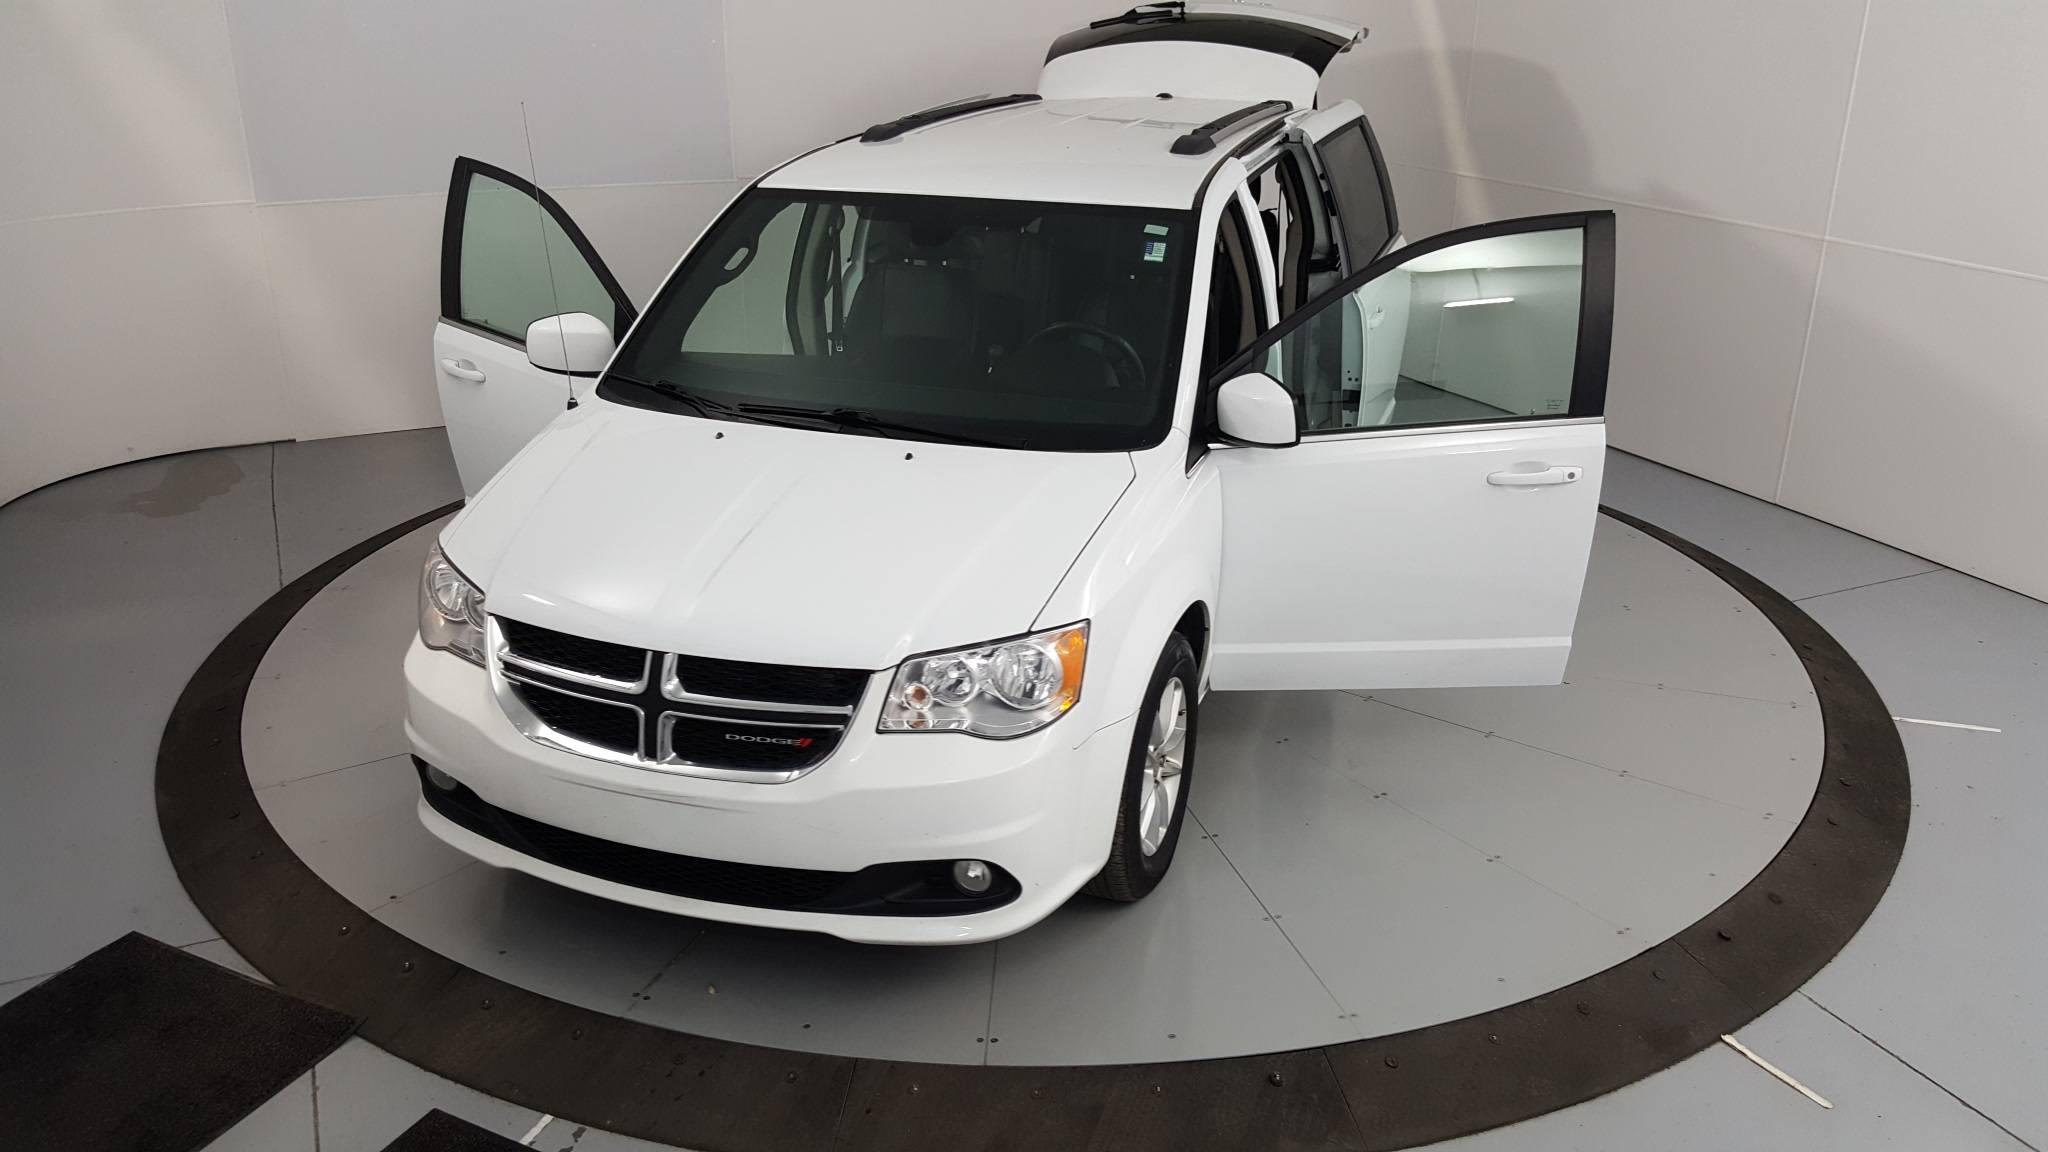 2019 Dodge Grand Caravan Mini-van, Passenger